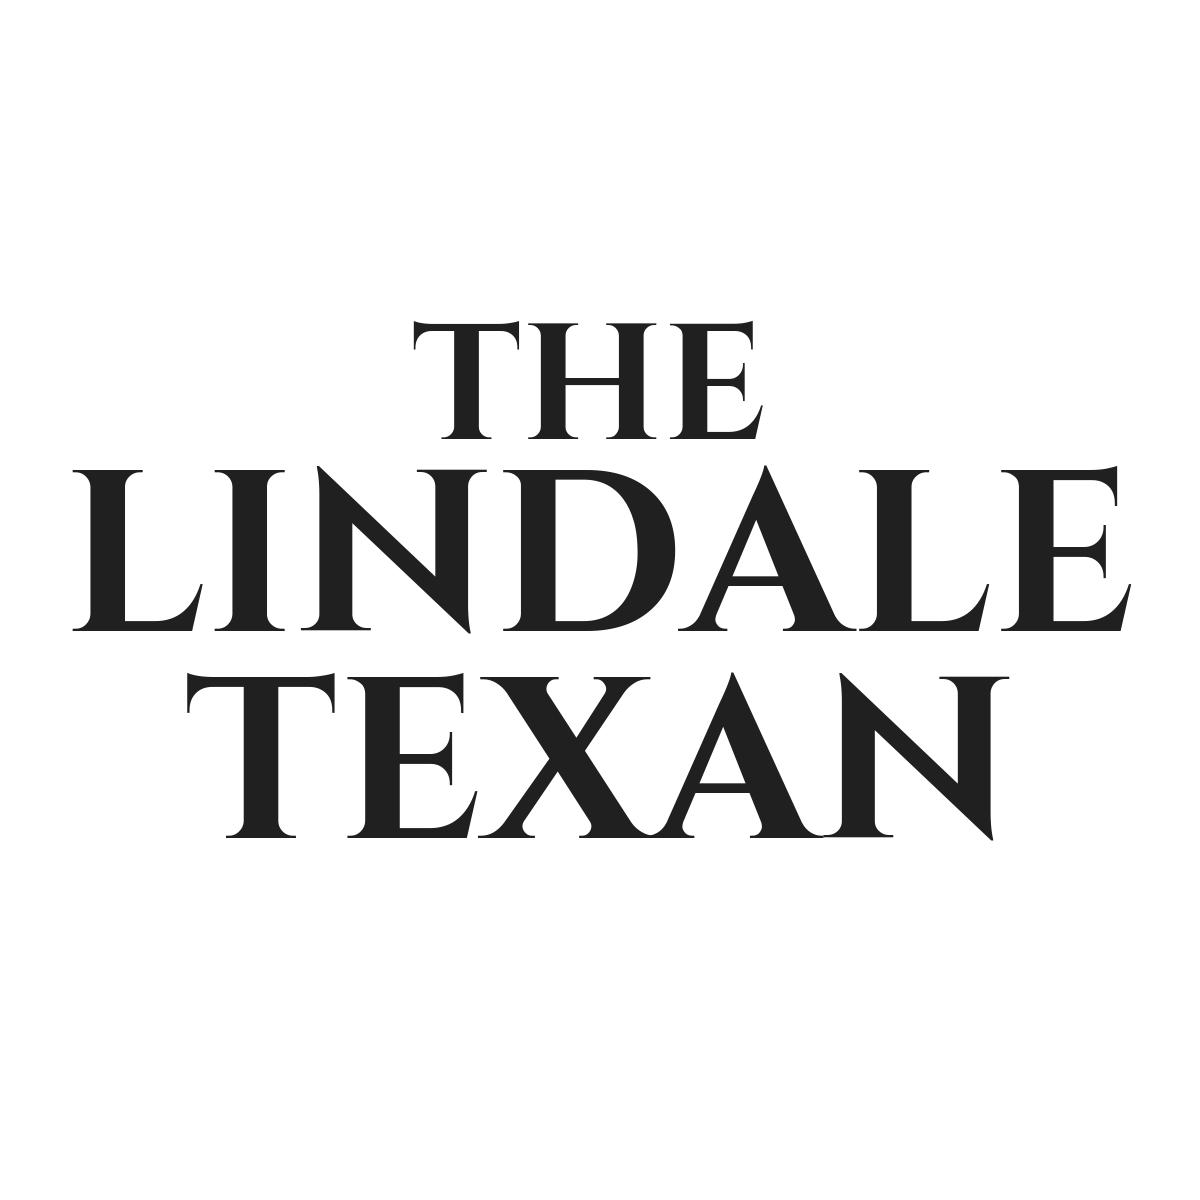 Lindale Texan